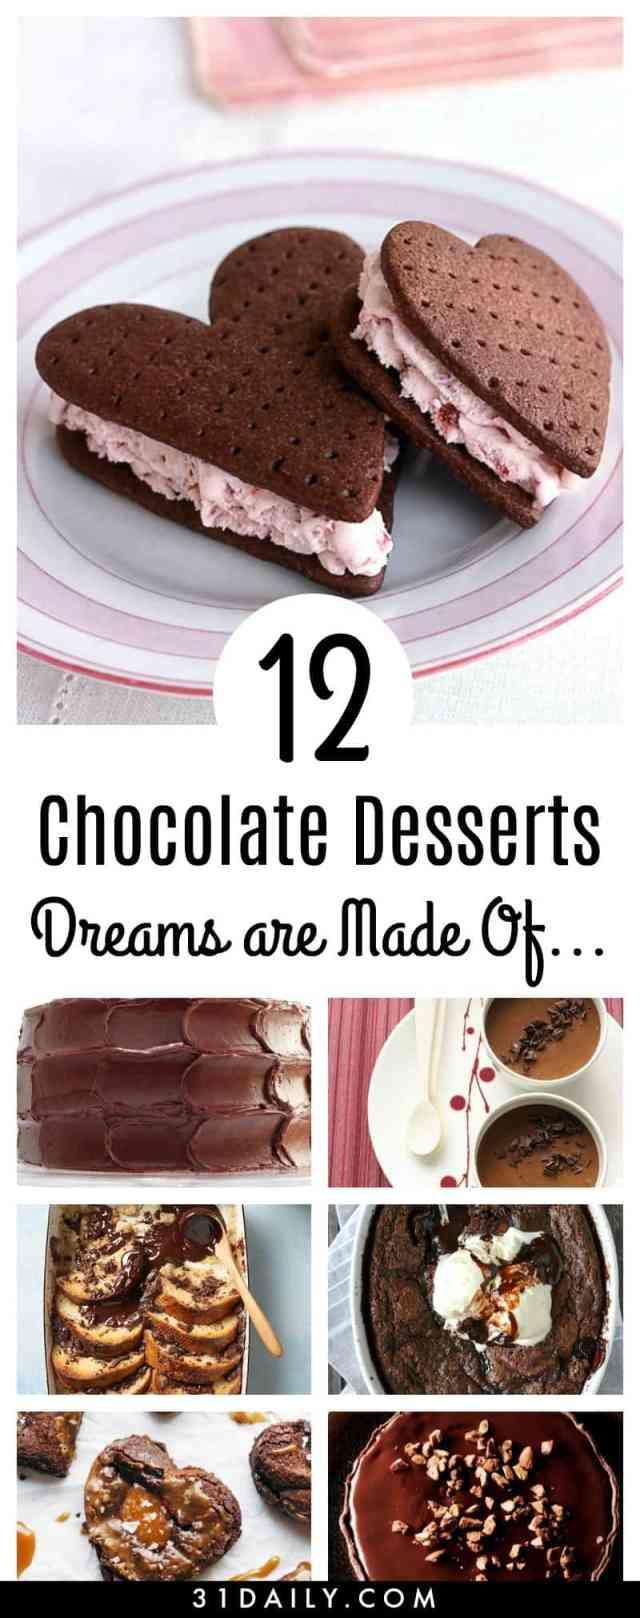 12 Chocolate Desserts Dreams are Made Of   31Daily.com